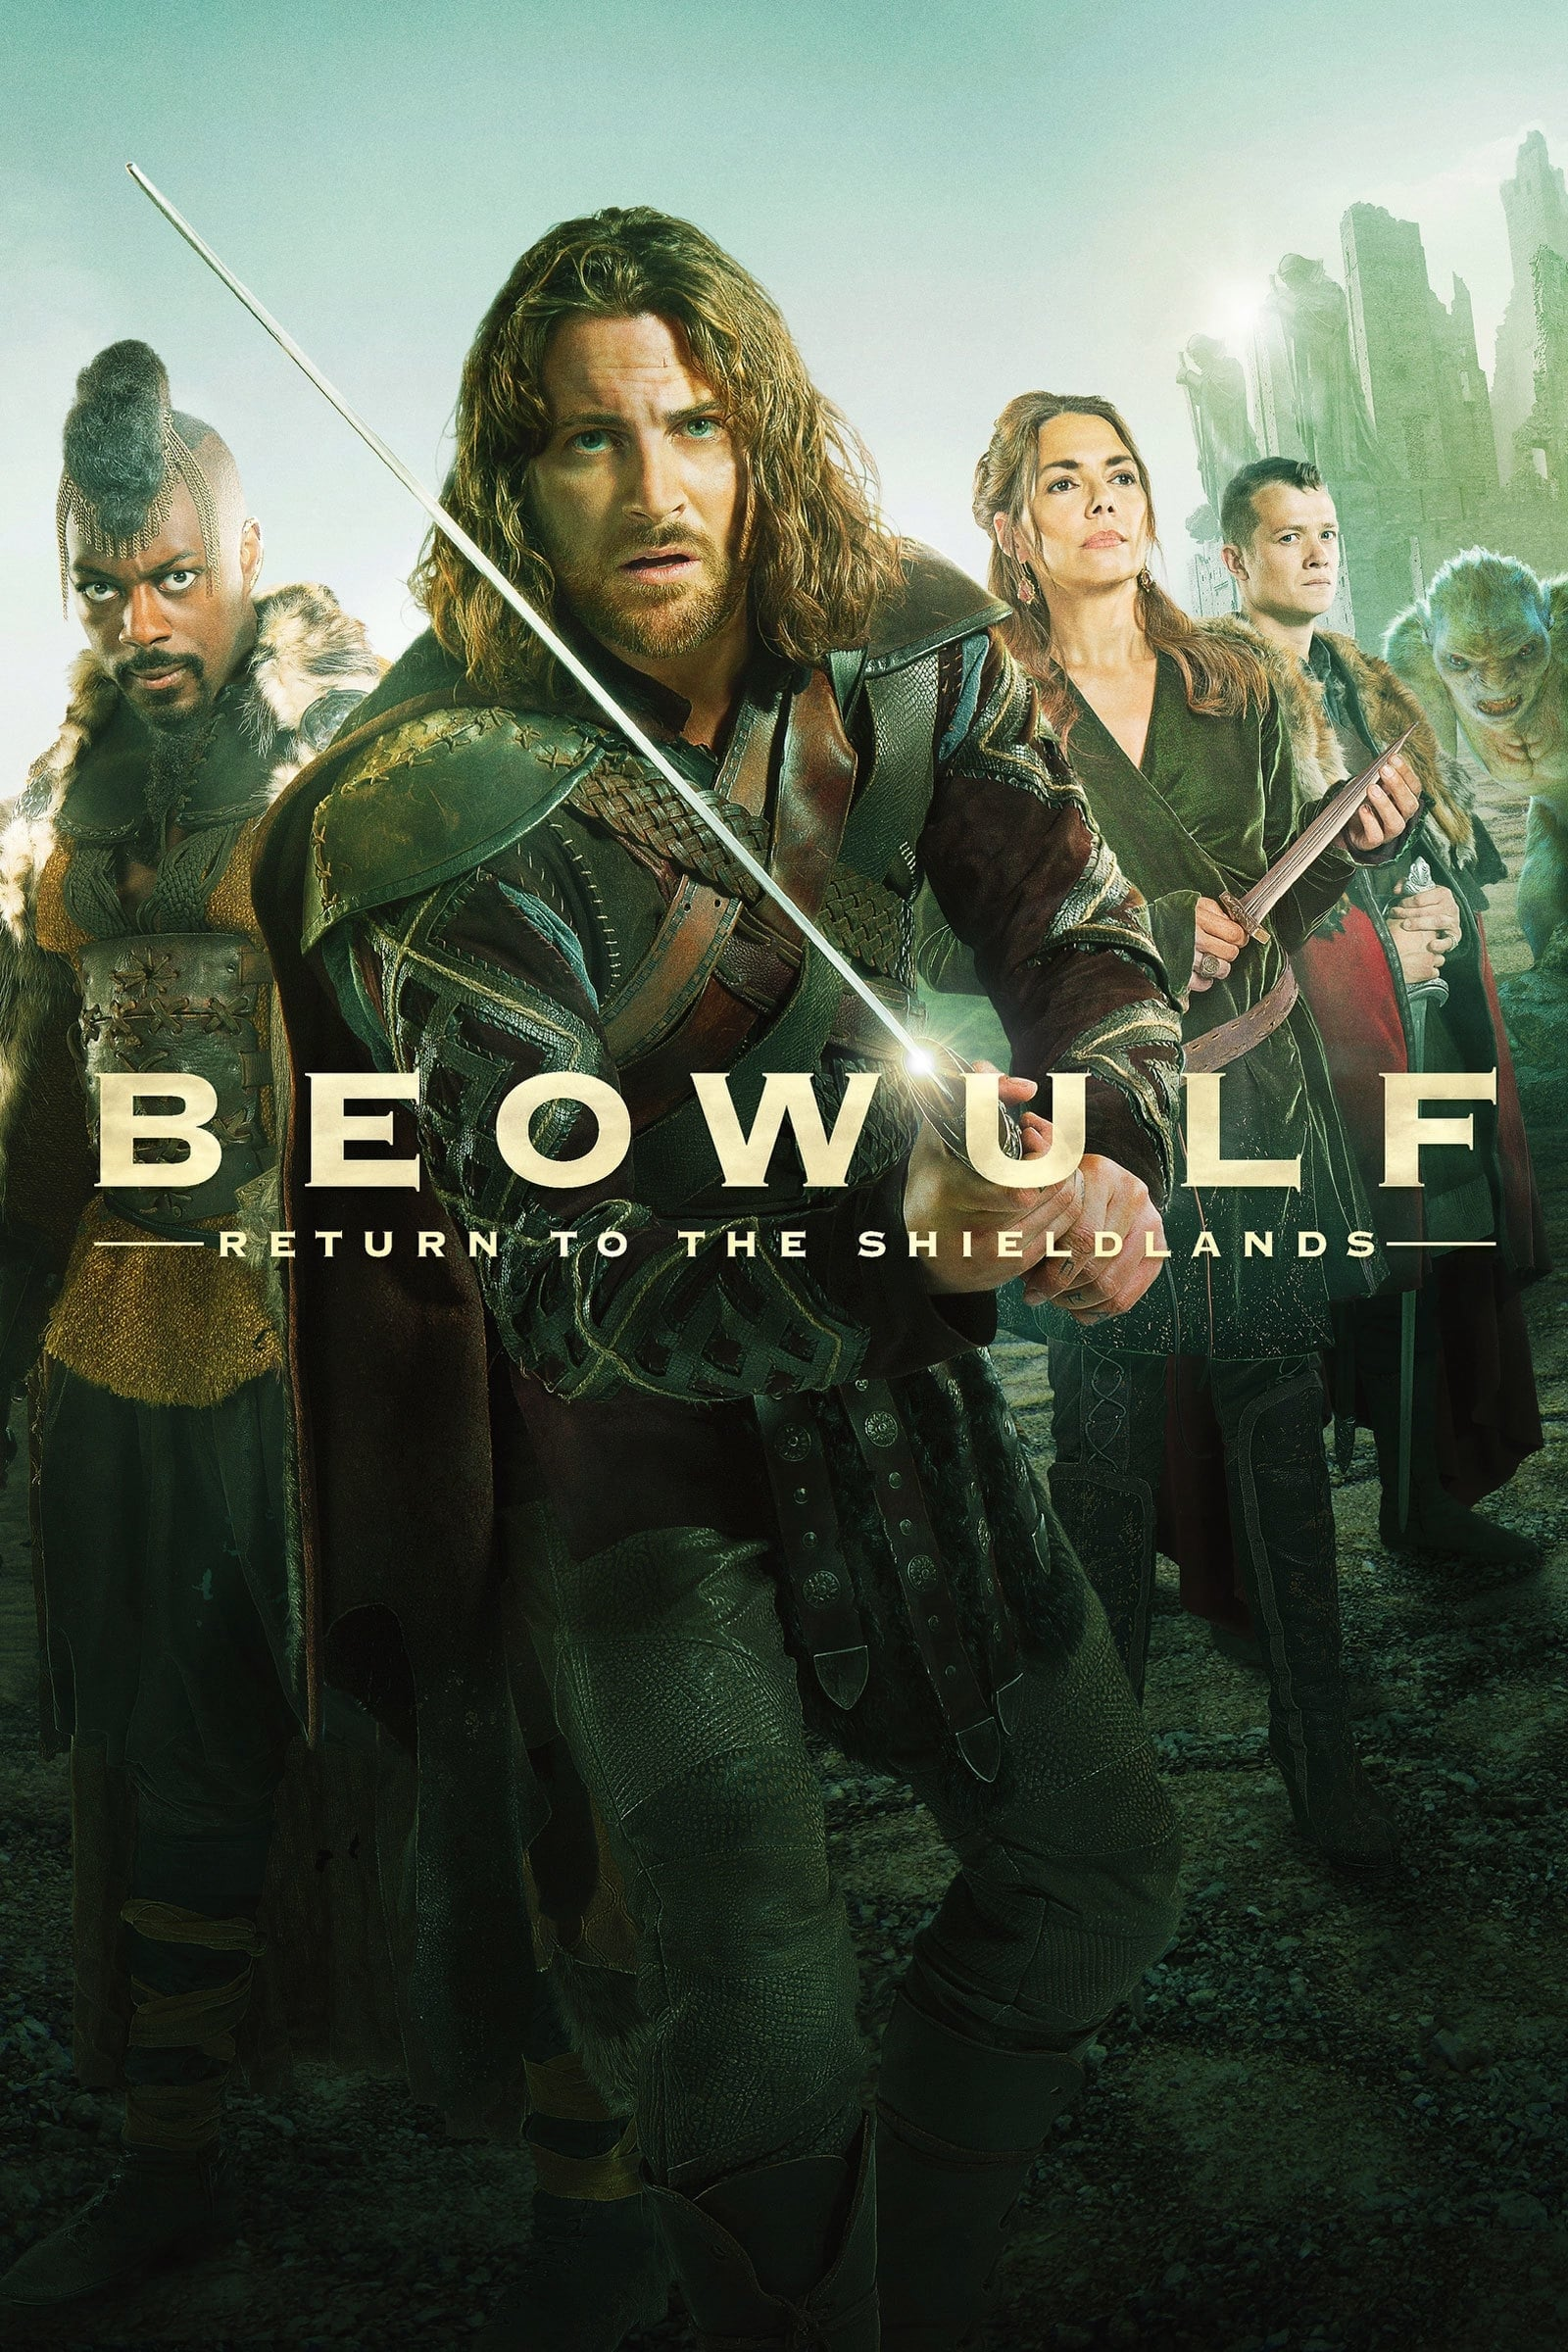 Beowulf: Return to the Shieldlands (2016)